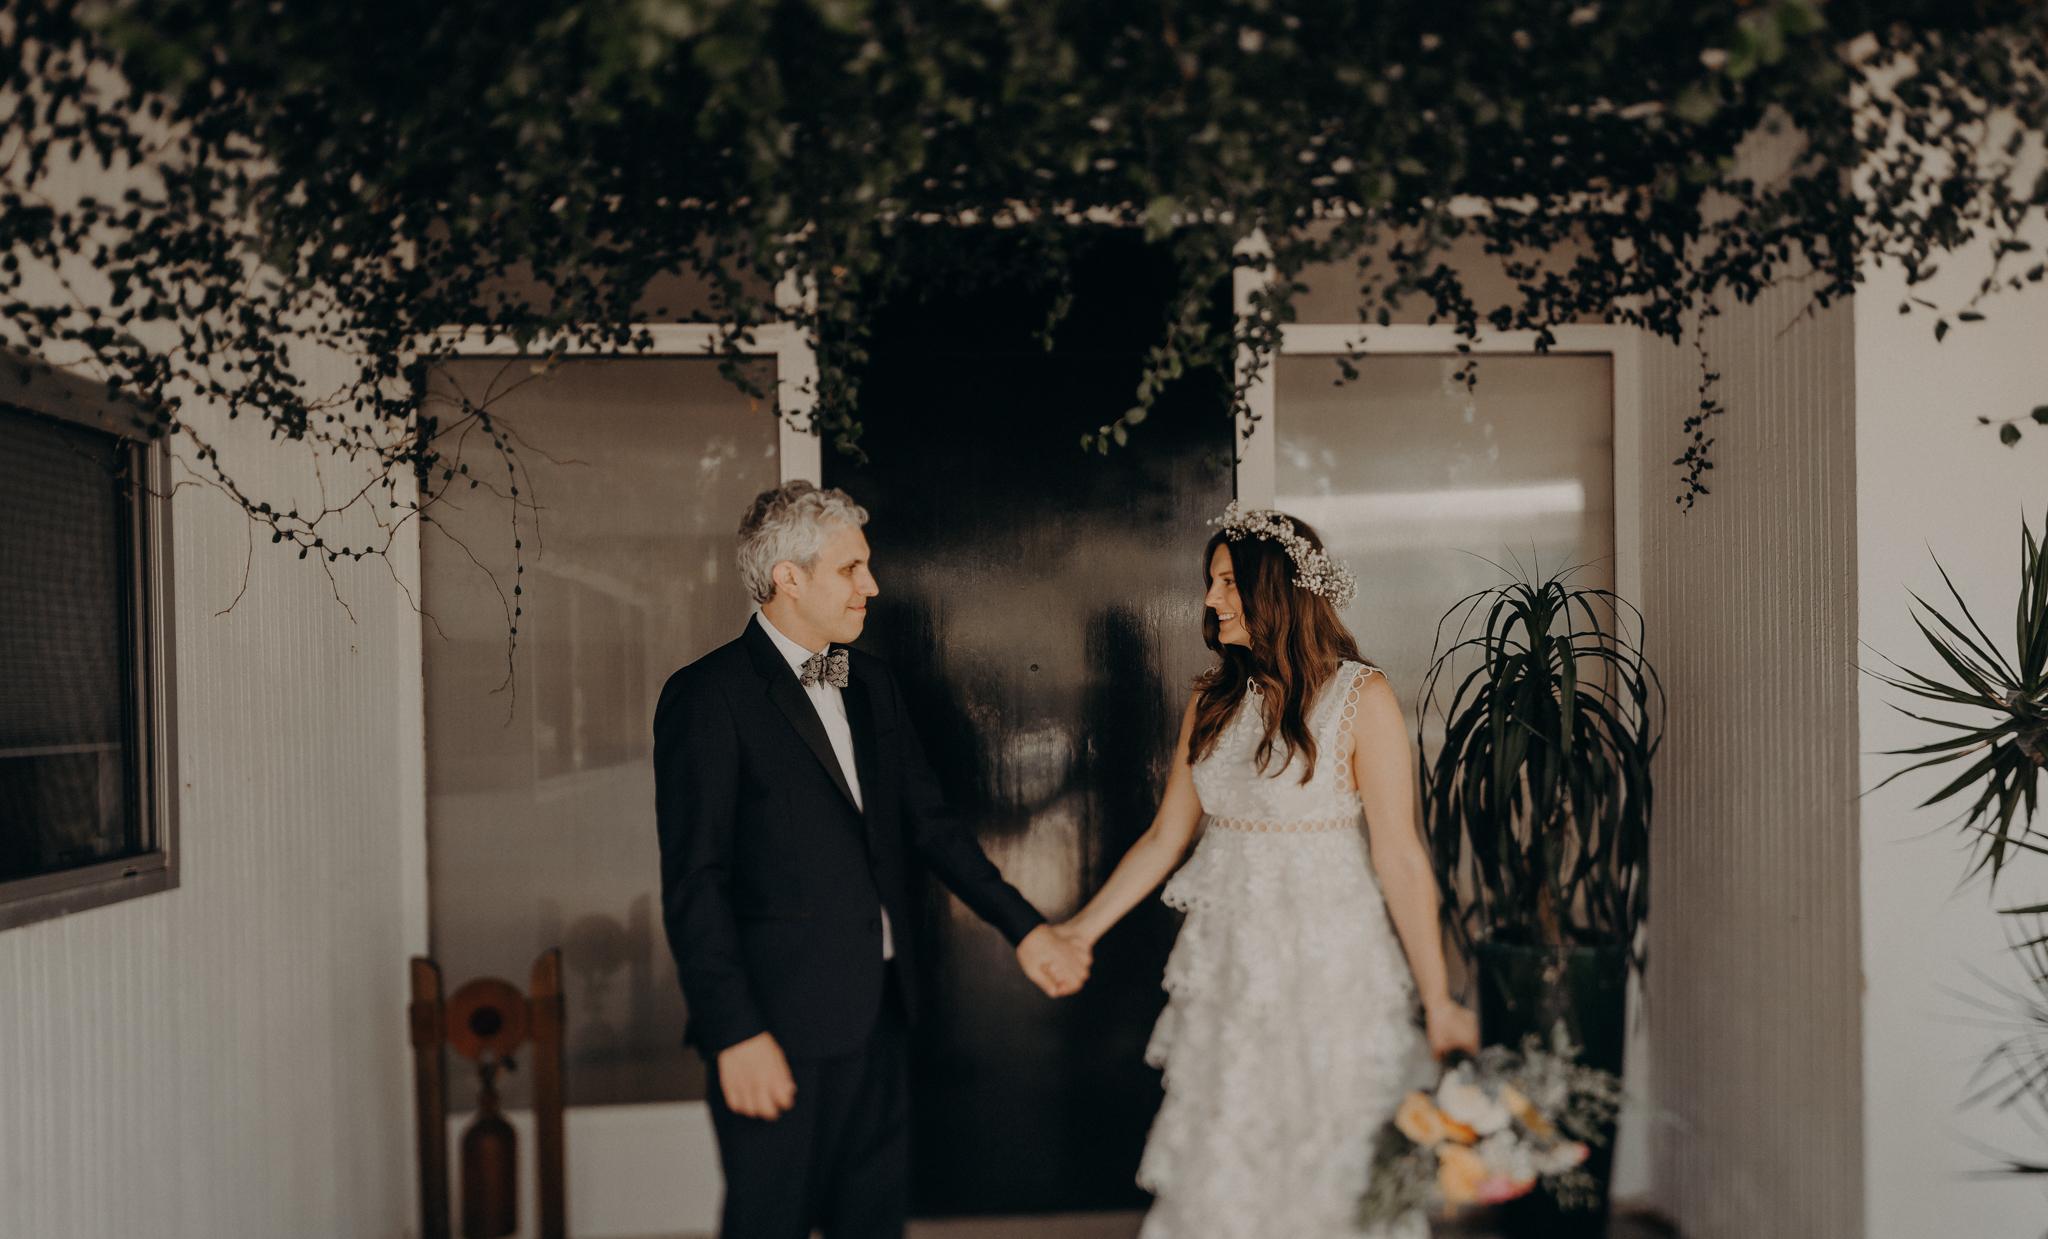 Isaiah + Taylor Photography - Private Estate Backyard Wedding - Beverly Hills - Los Angeles Wedding Photographer - 16.jpg